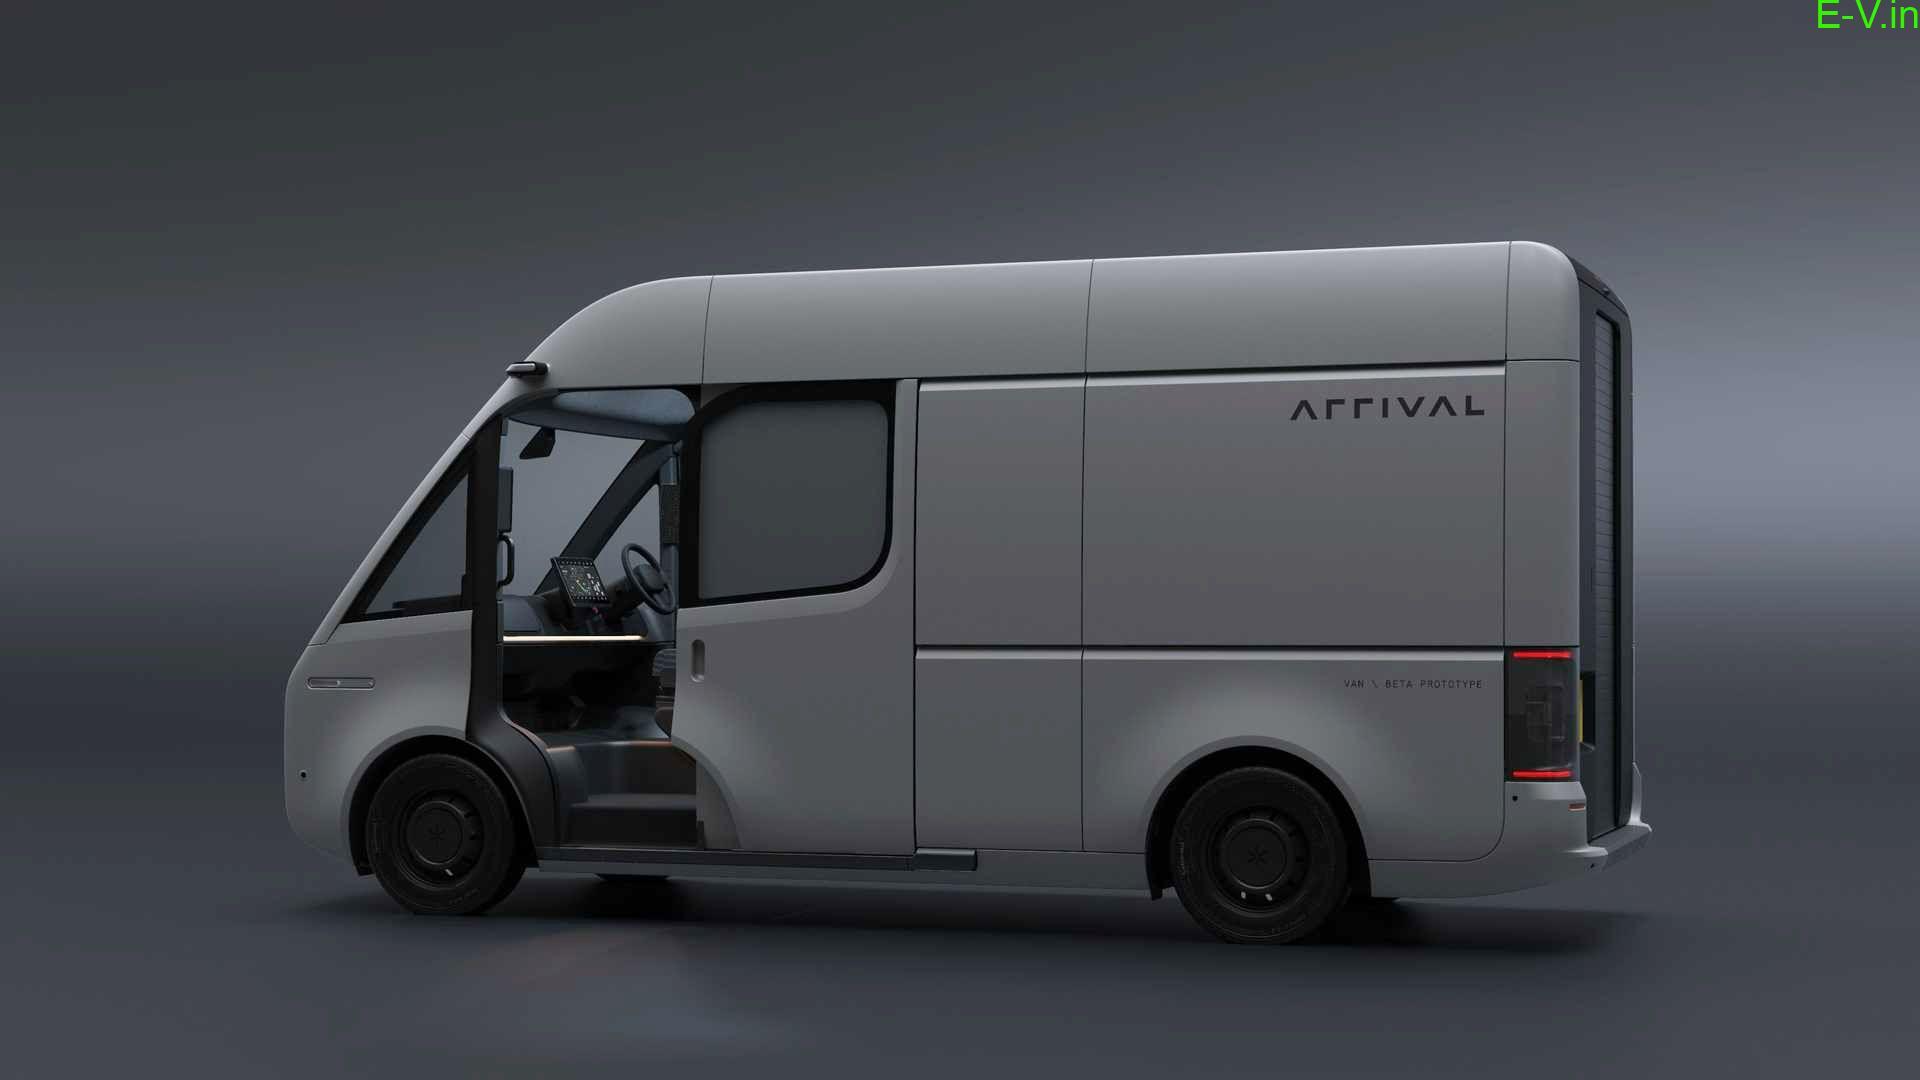 Arrival unveils its electric van